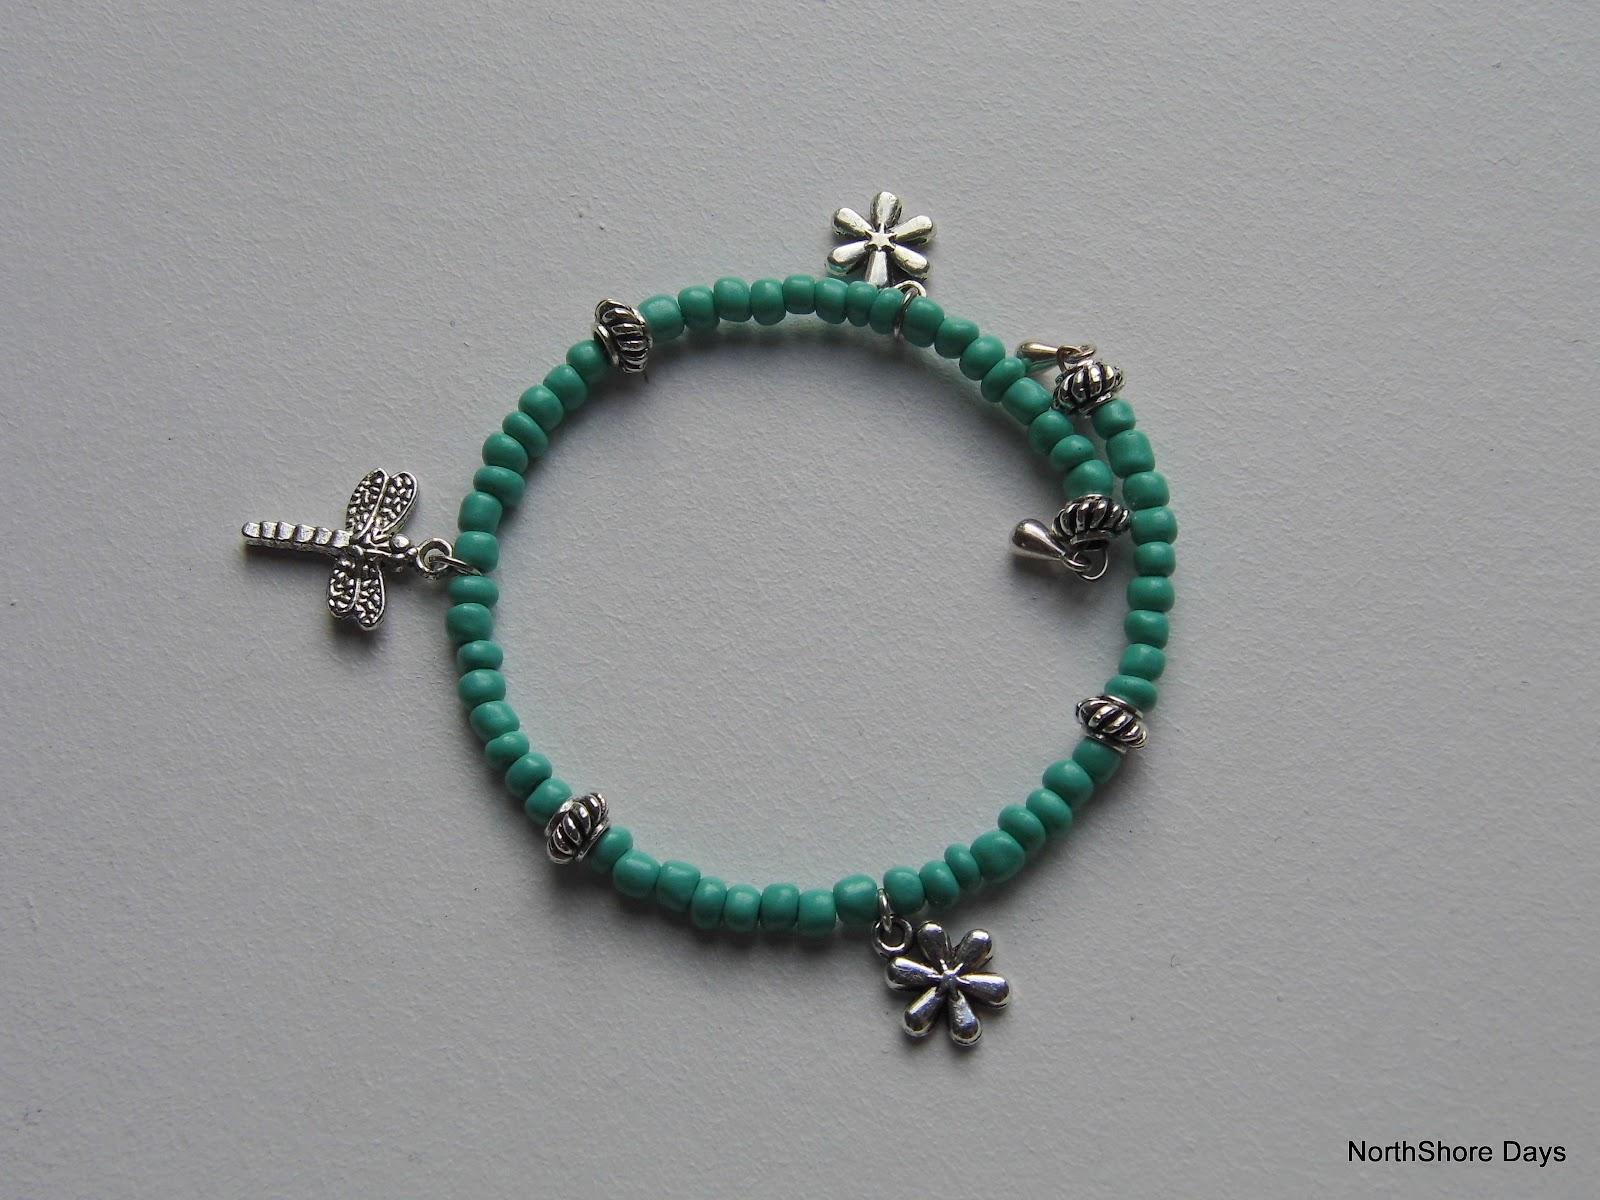 northshore days memory wire charm bracelets